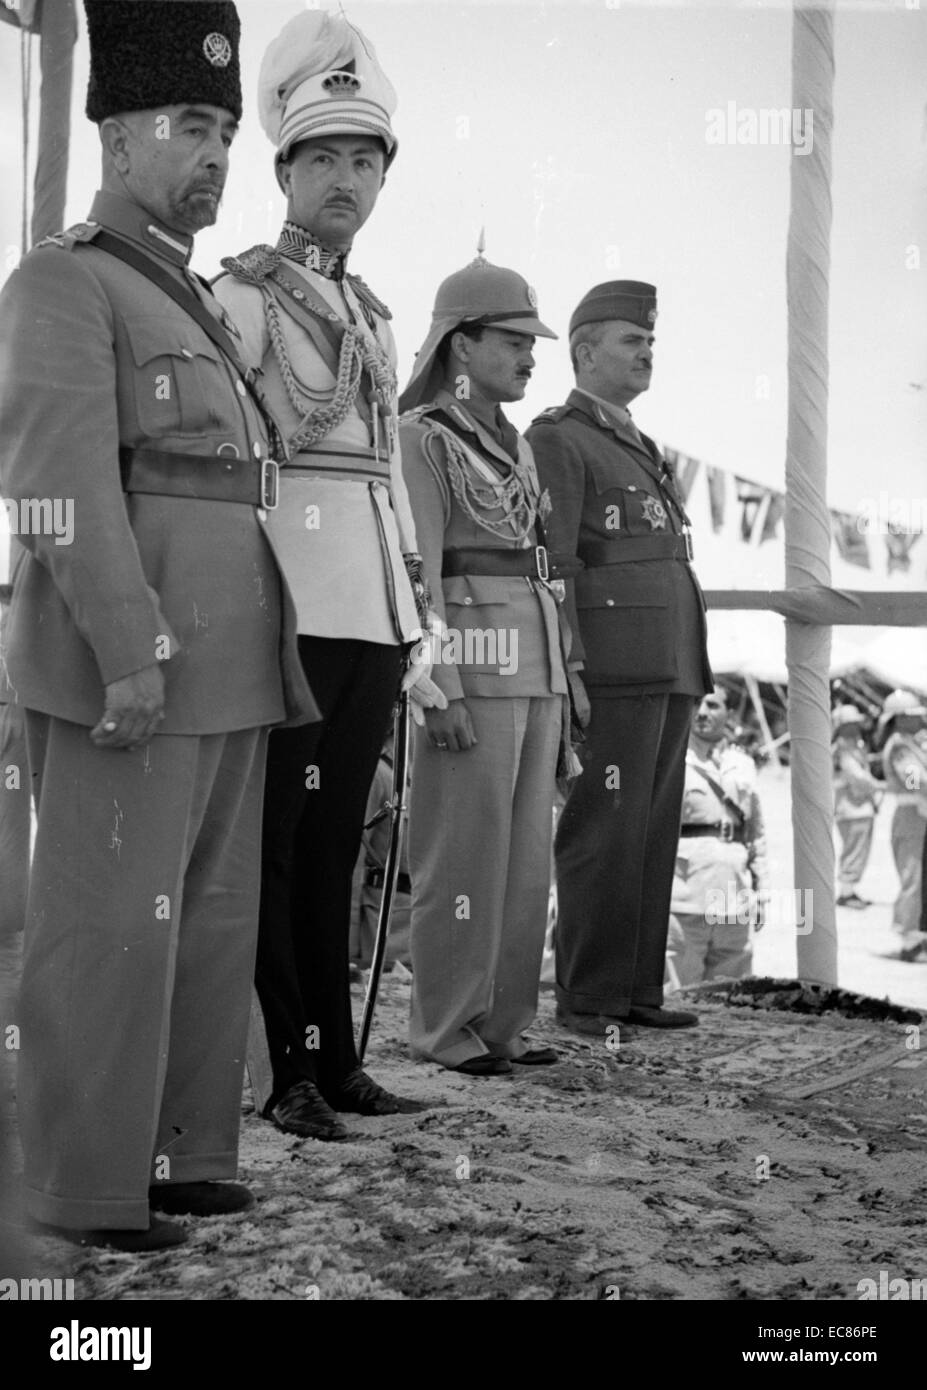 Photograph of Coronation of King Abdullah, in Amman Jordan. Dated 1946 - Stock Image